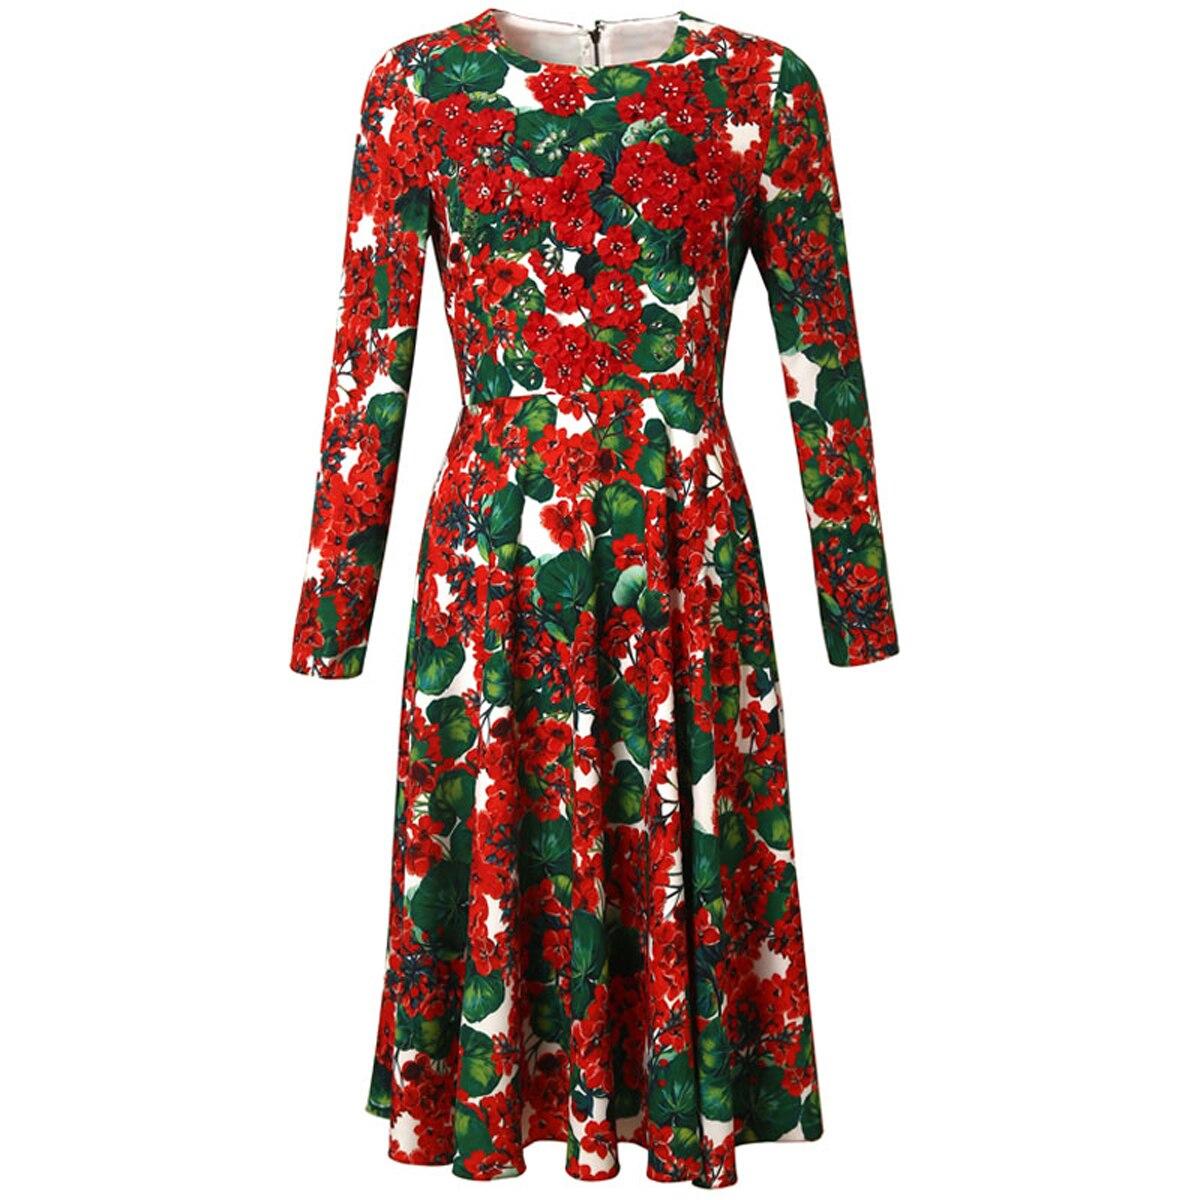 Red RoosaRosee Designer Runway Women 3d Flower Applique Bead Dress Spring Autumn Long Sleeve Floral Print